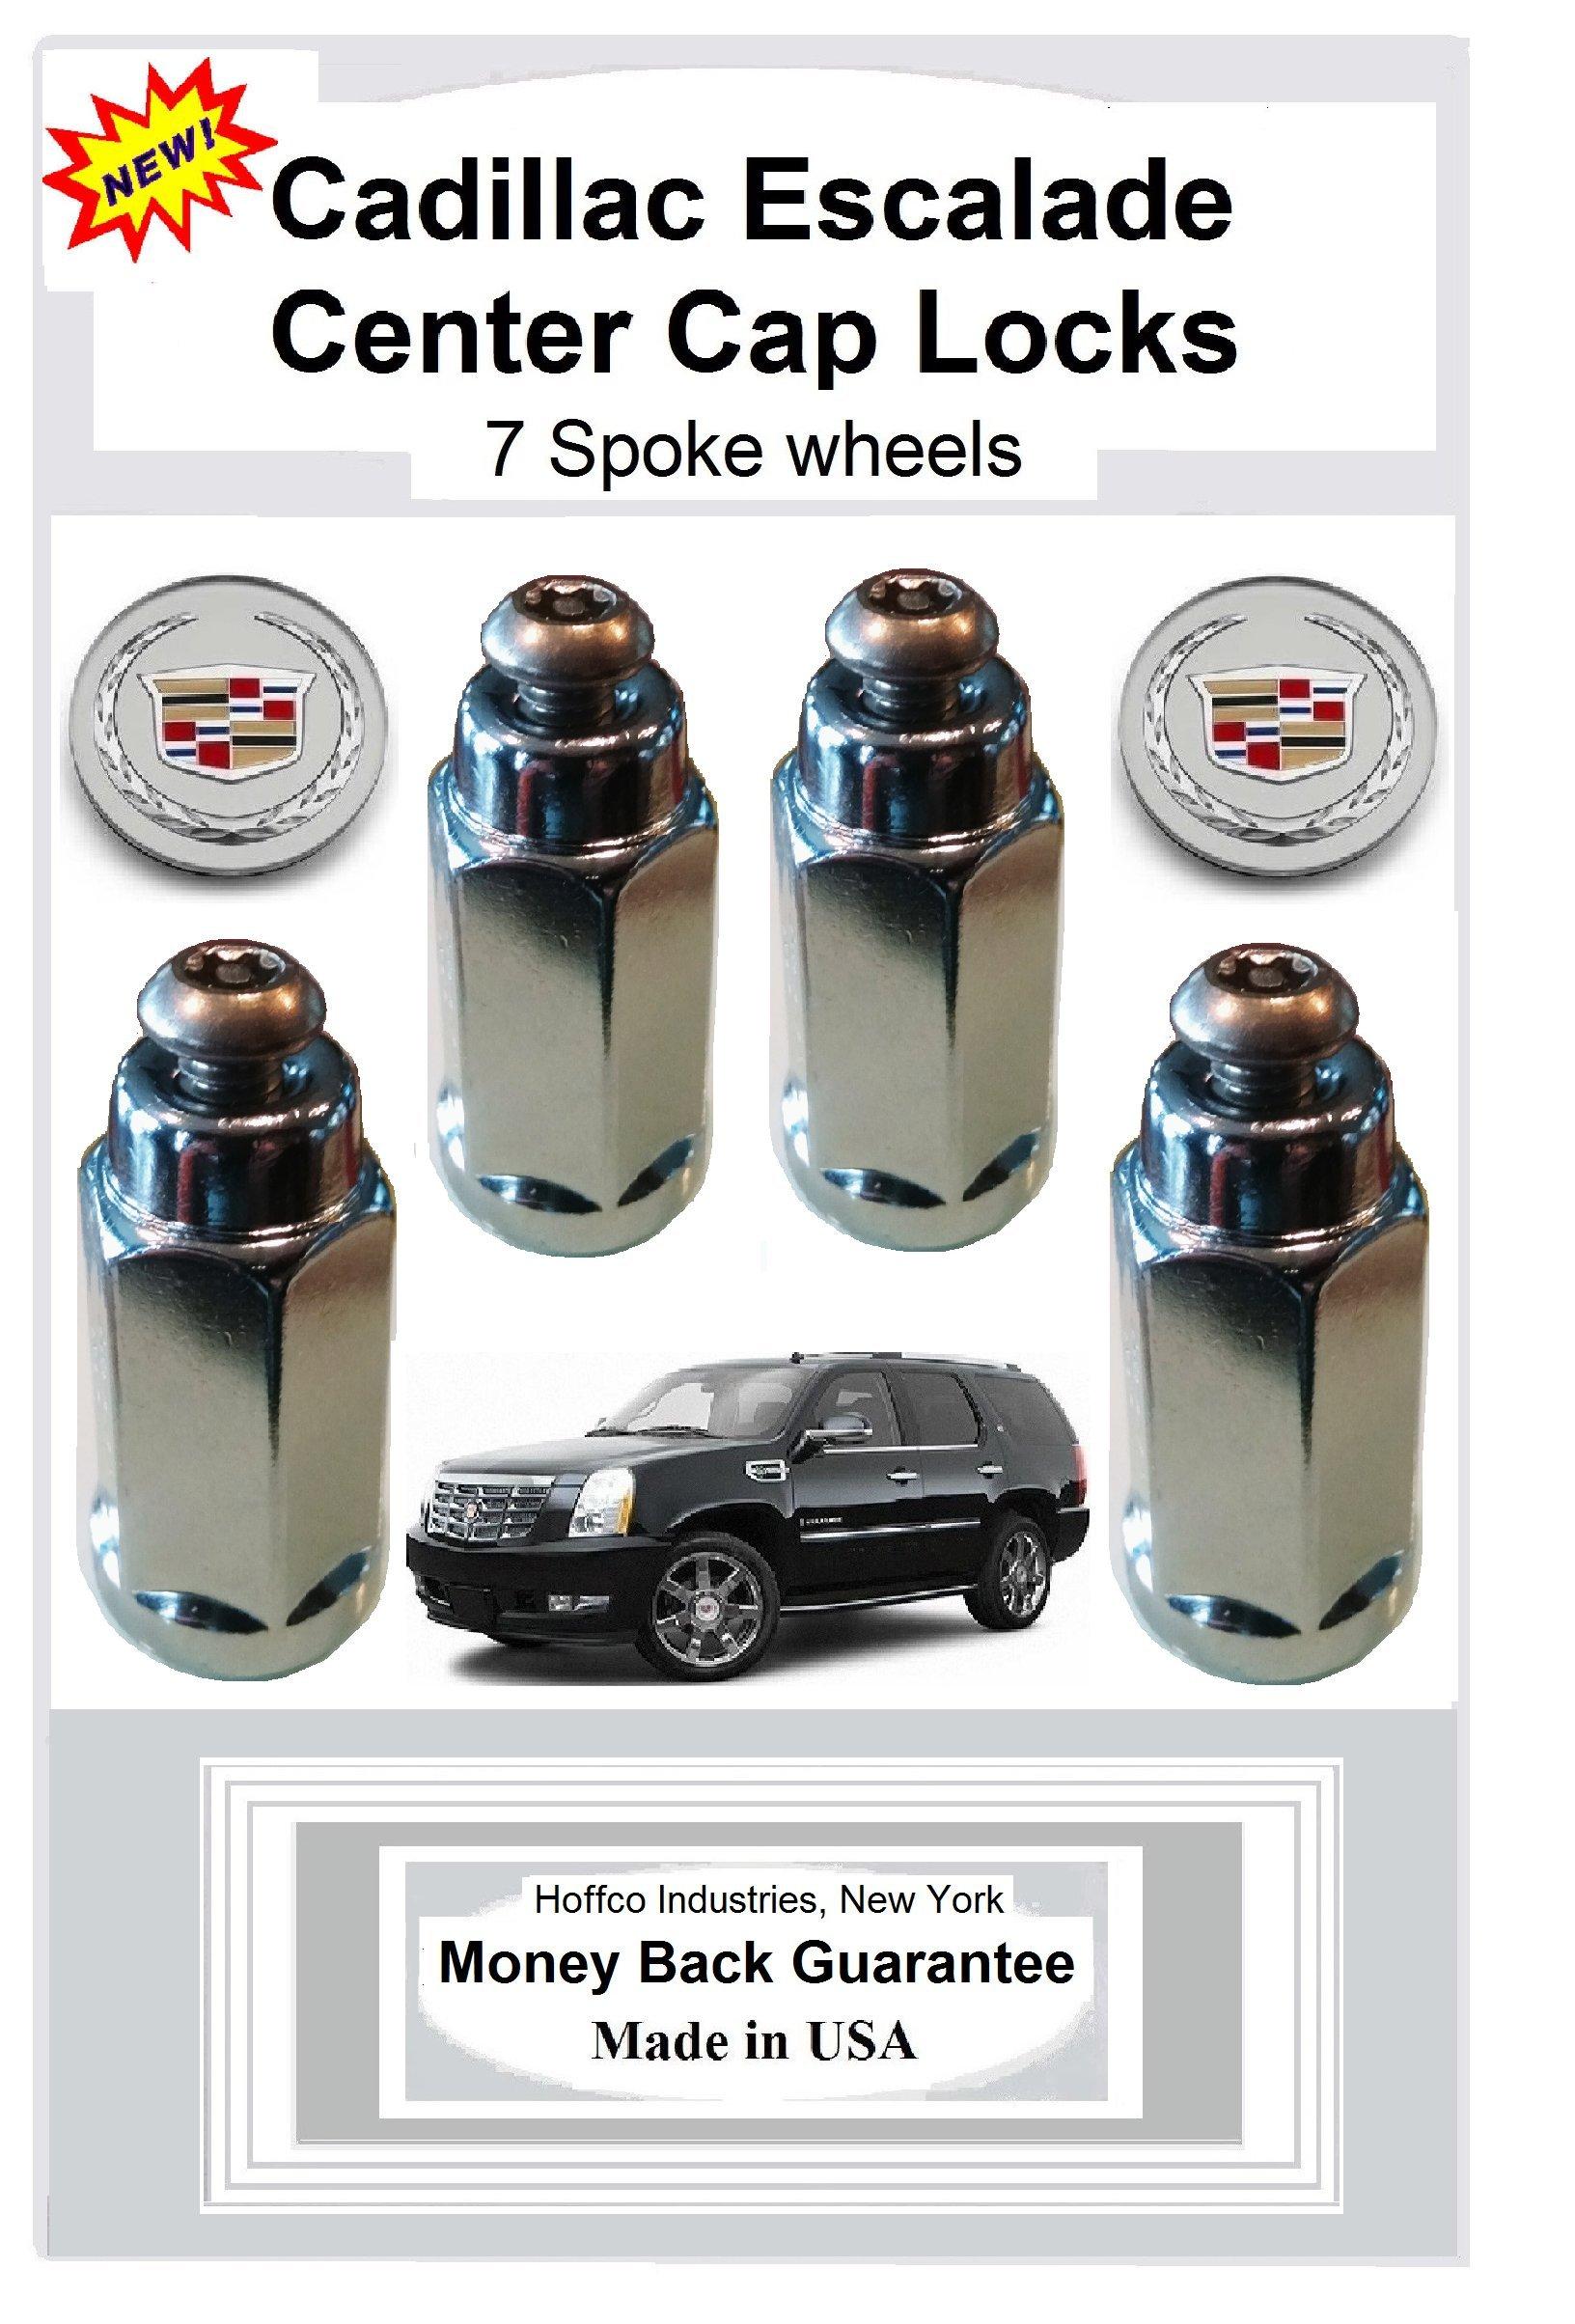 Cadillac Escalade Center Cap Locks for 7 spoke wheels